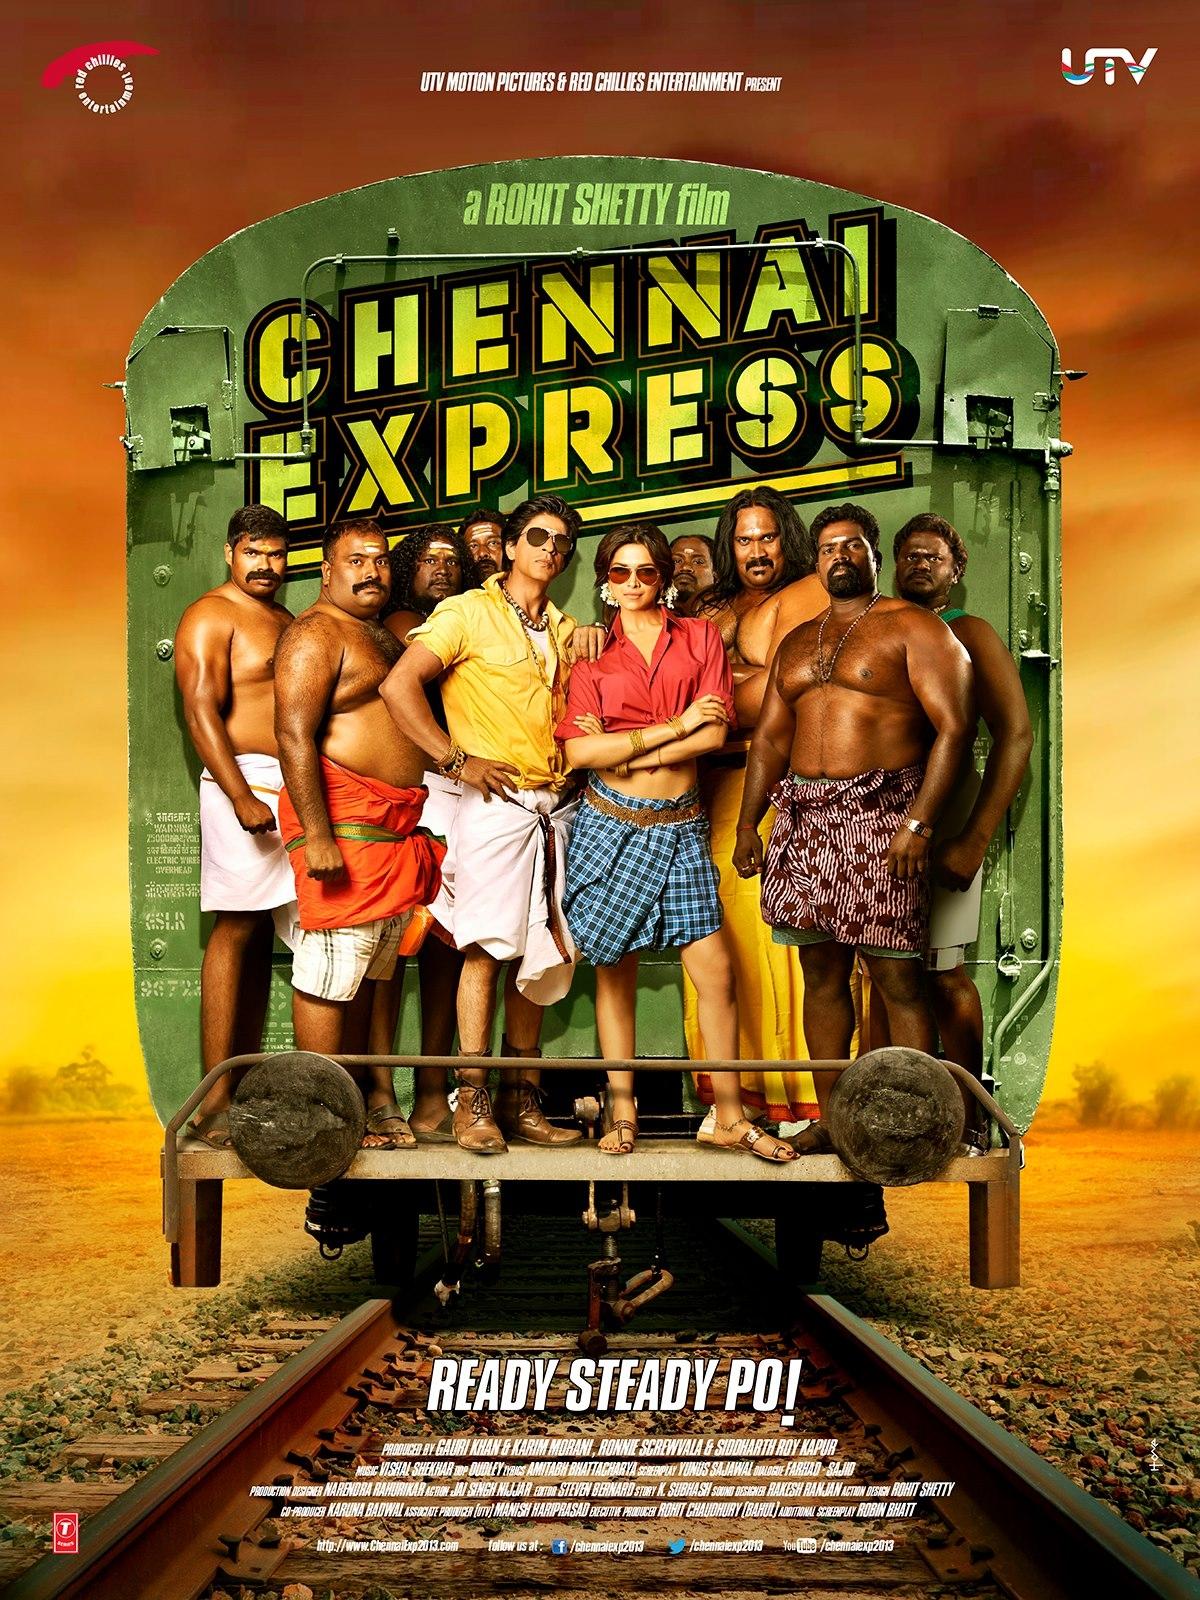 Chennai Express - Movie Poster #5 (Original)